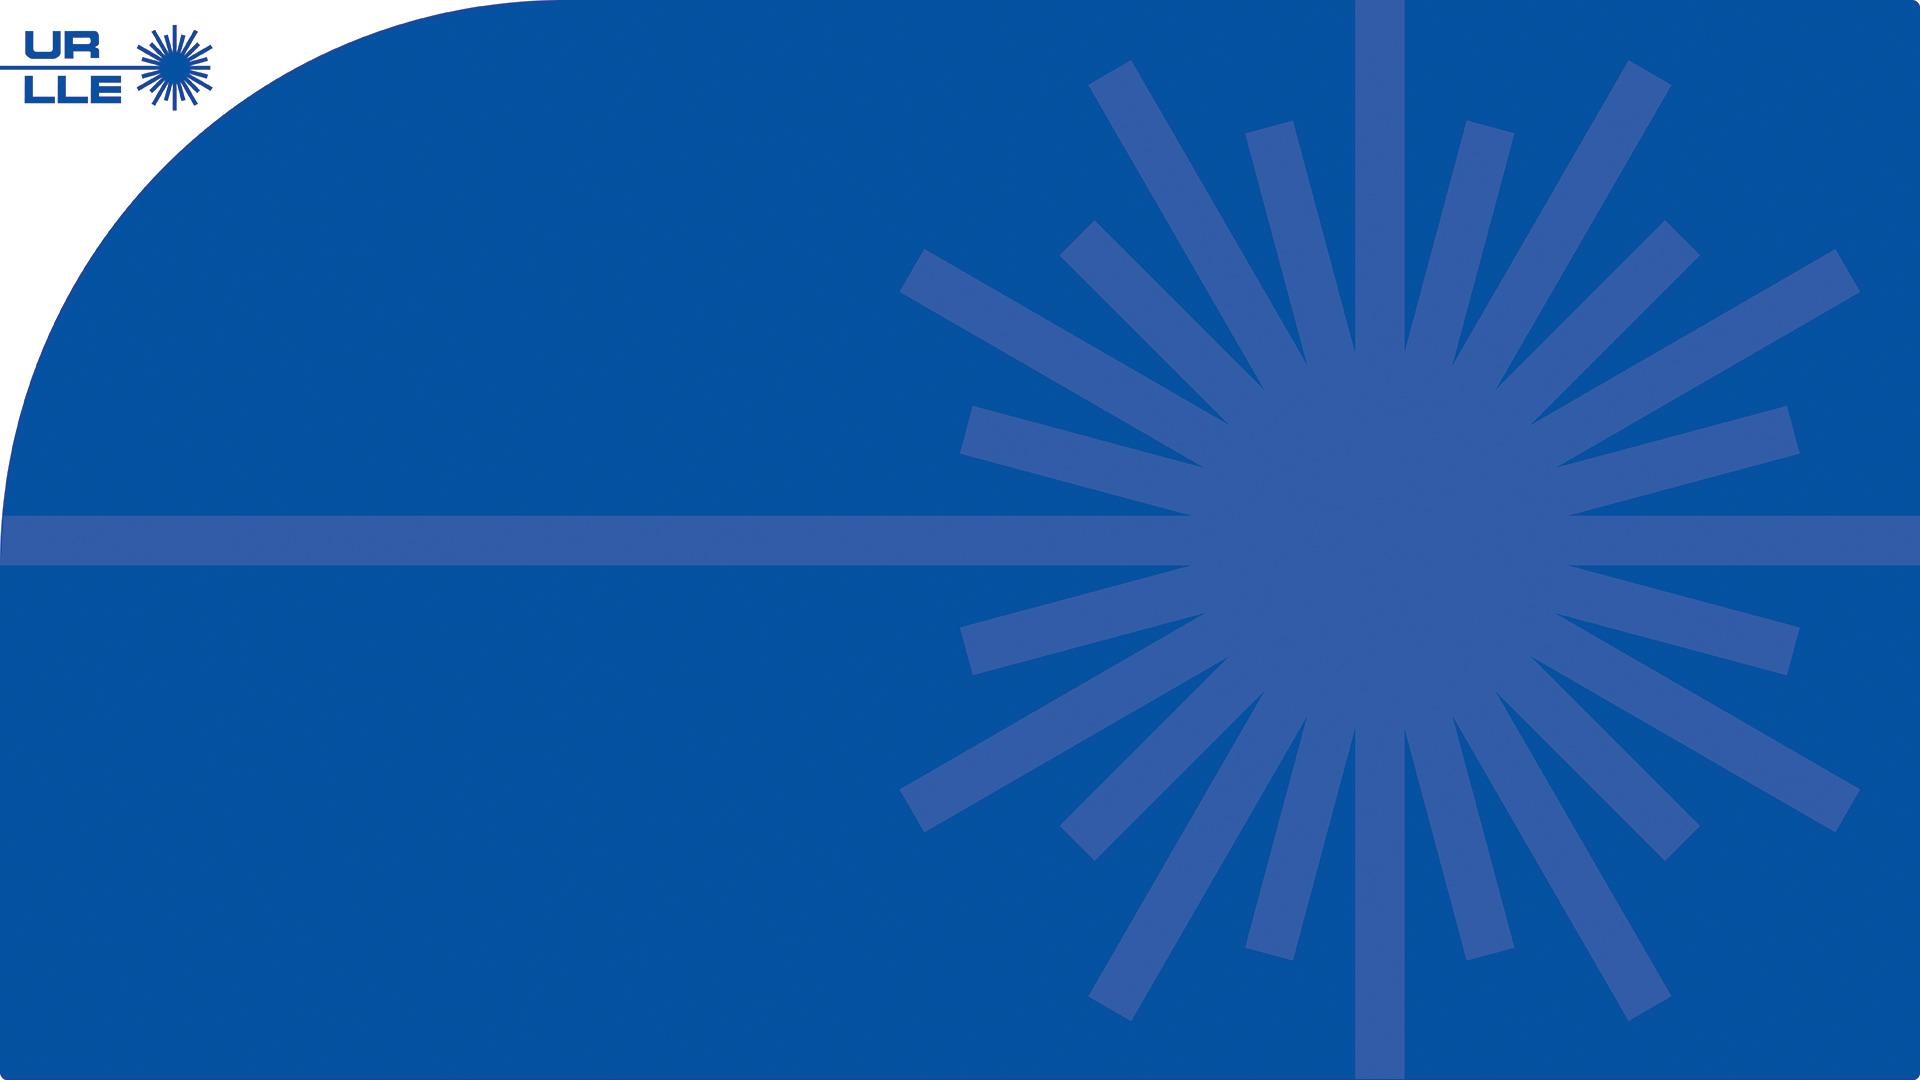 LLE Zoom background with logo, blue, large burst